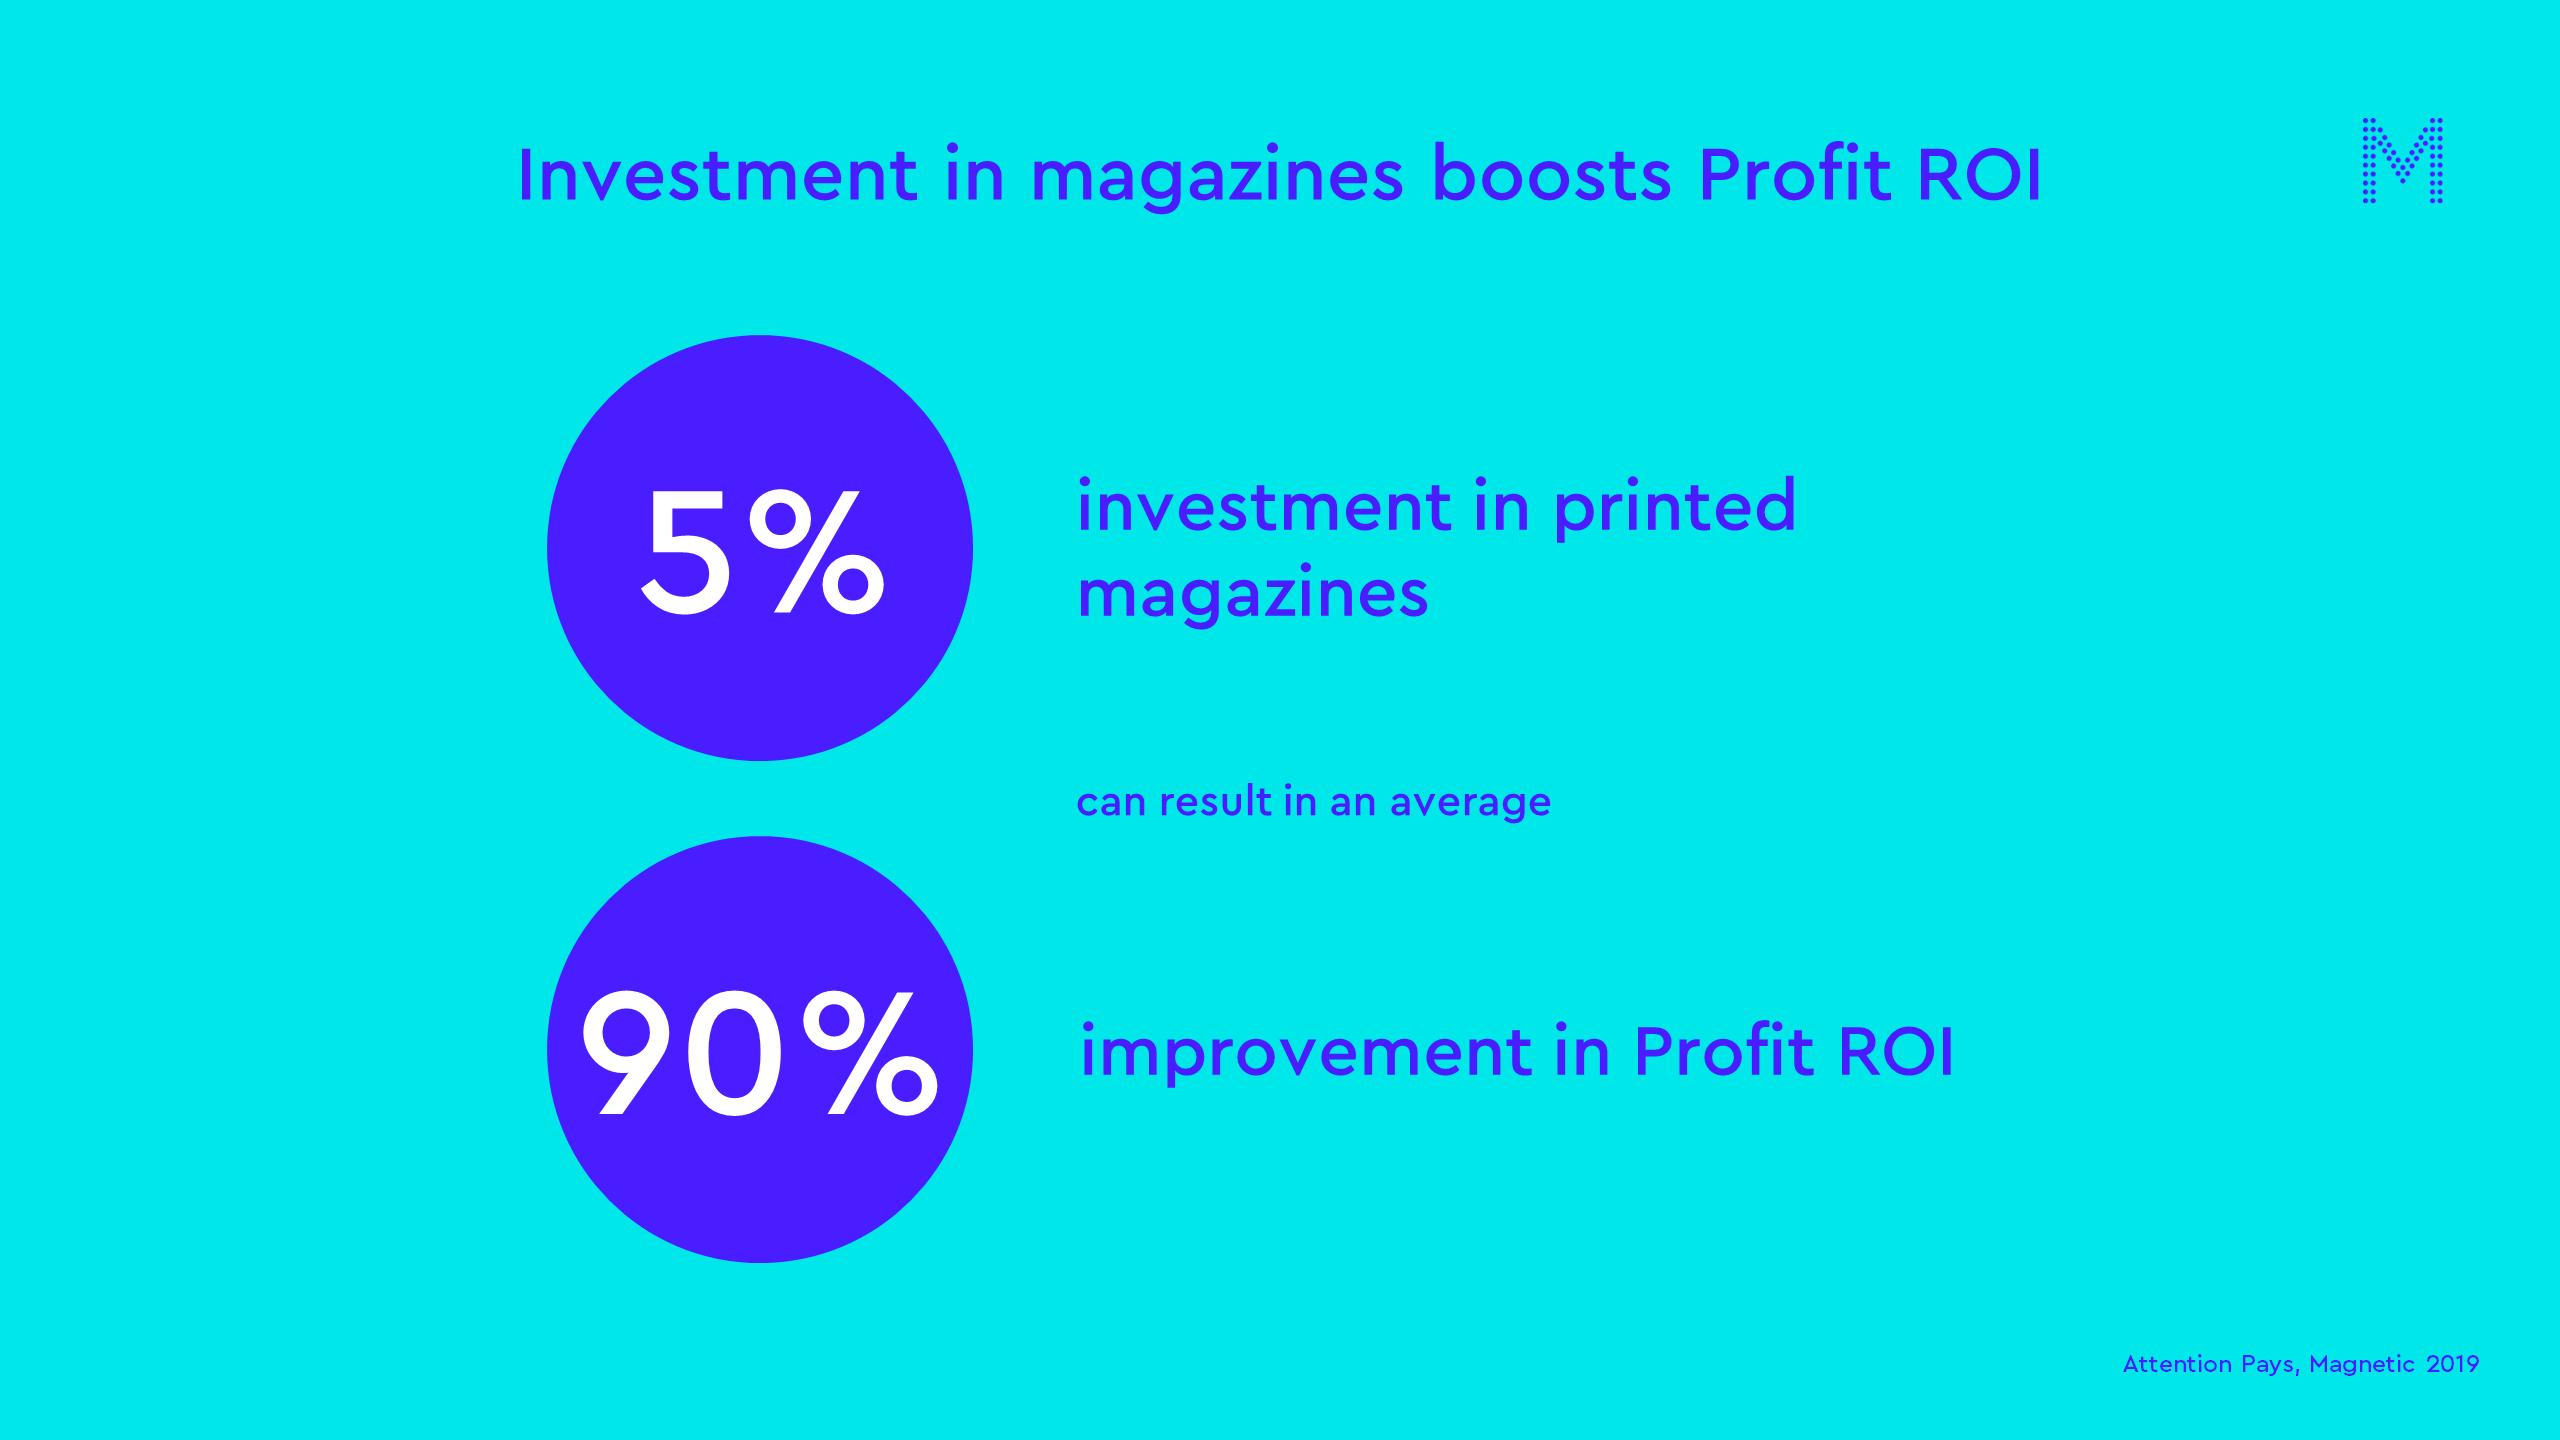 Investment in magazines boosts Profit ROI